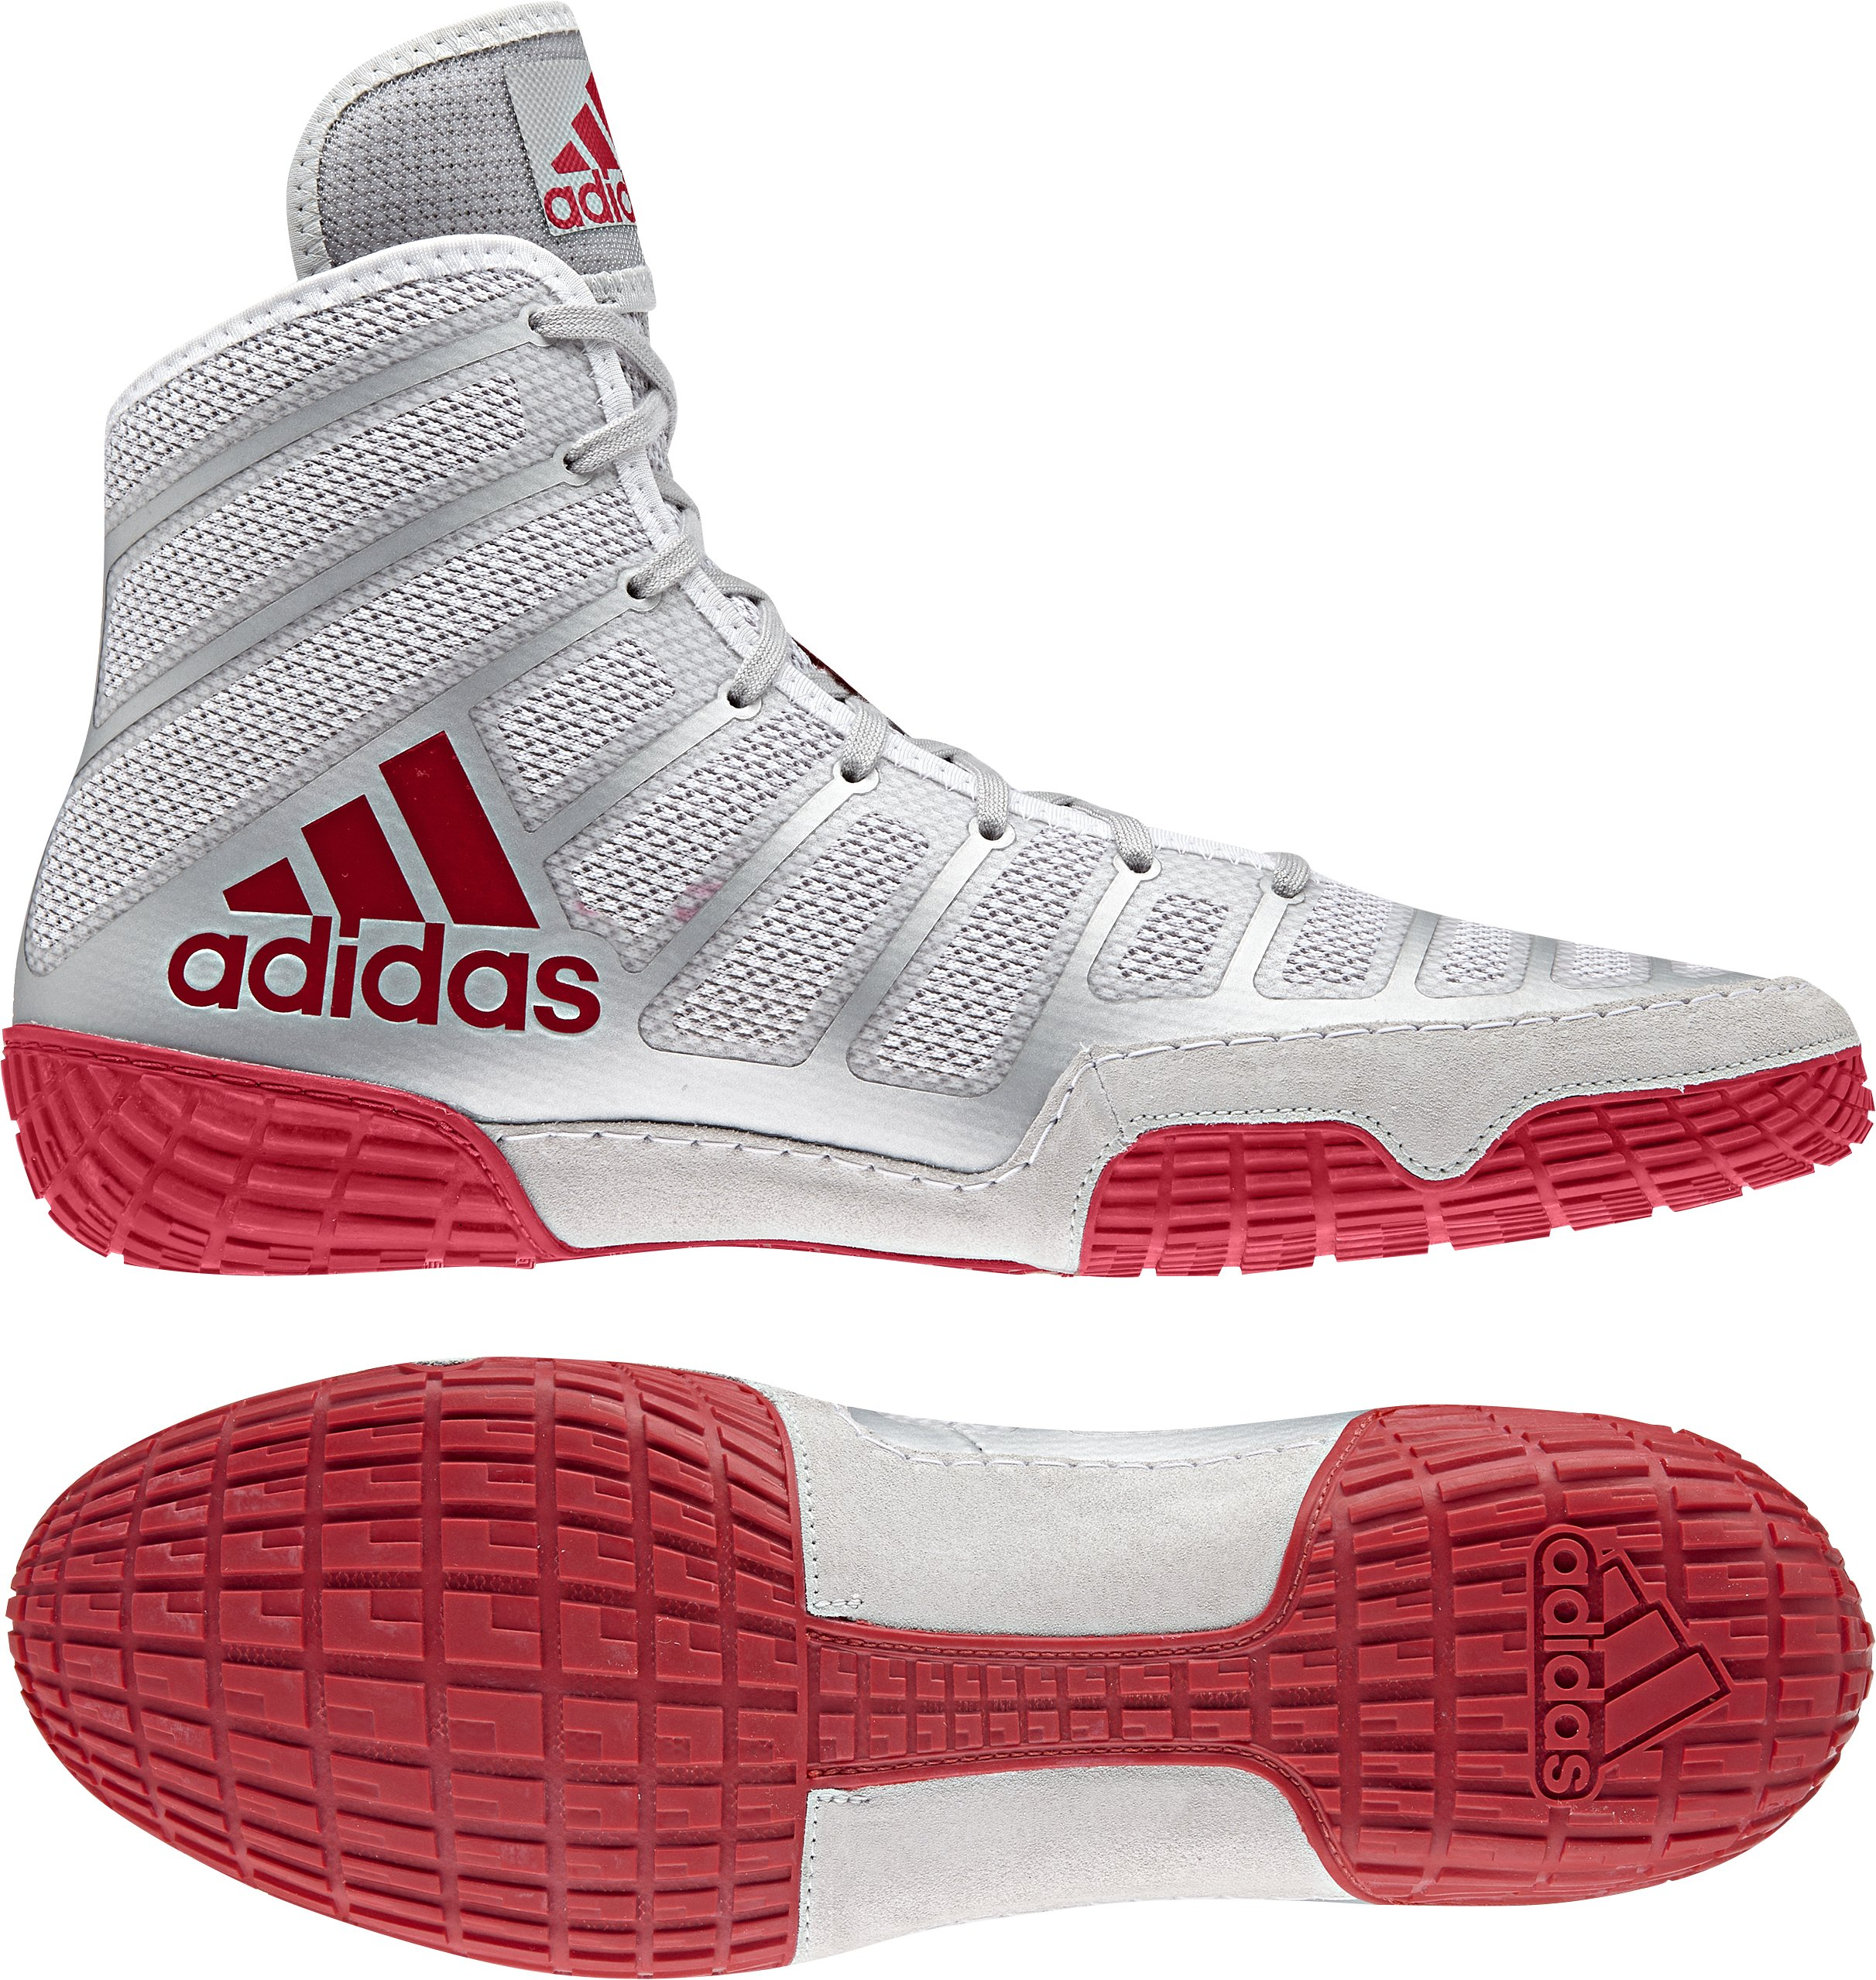 pretty nice f5541 4534a Galleon - Adidas Adizero Varner Wrestling Shoes - Red Silver Red - Mens - 9